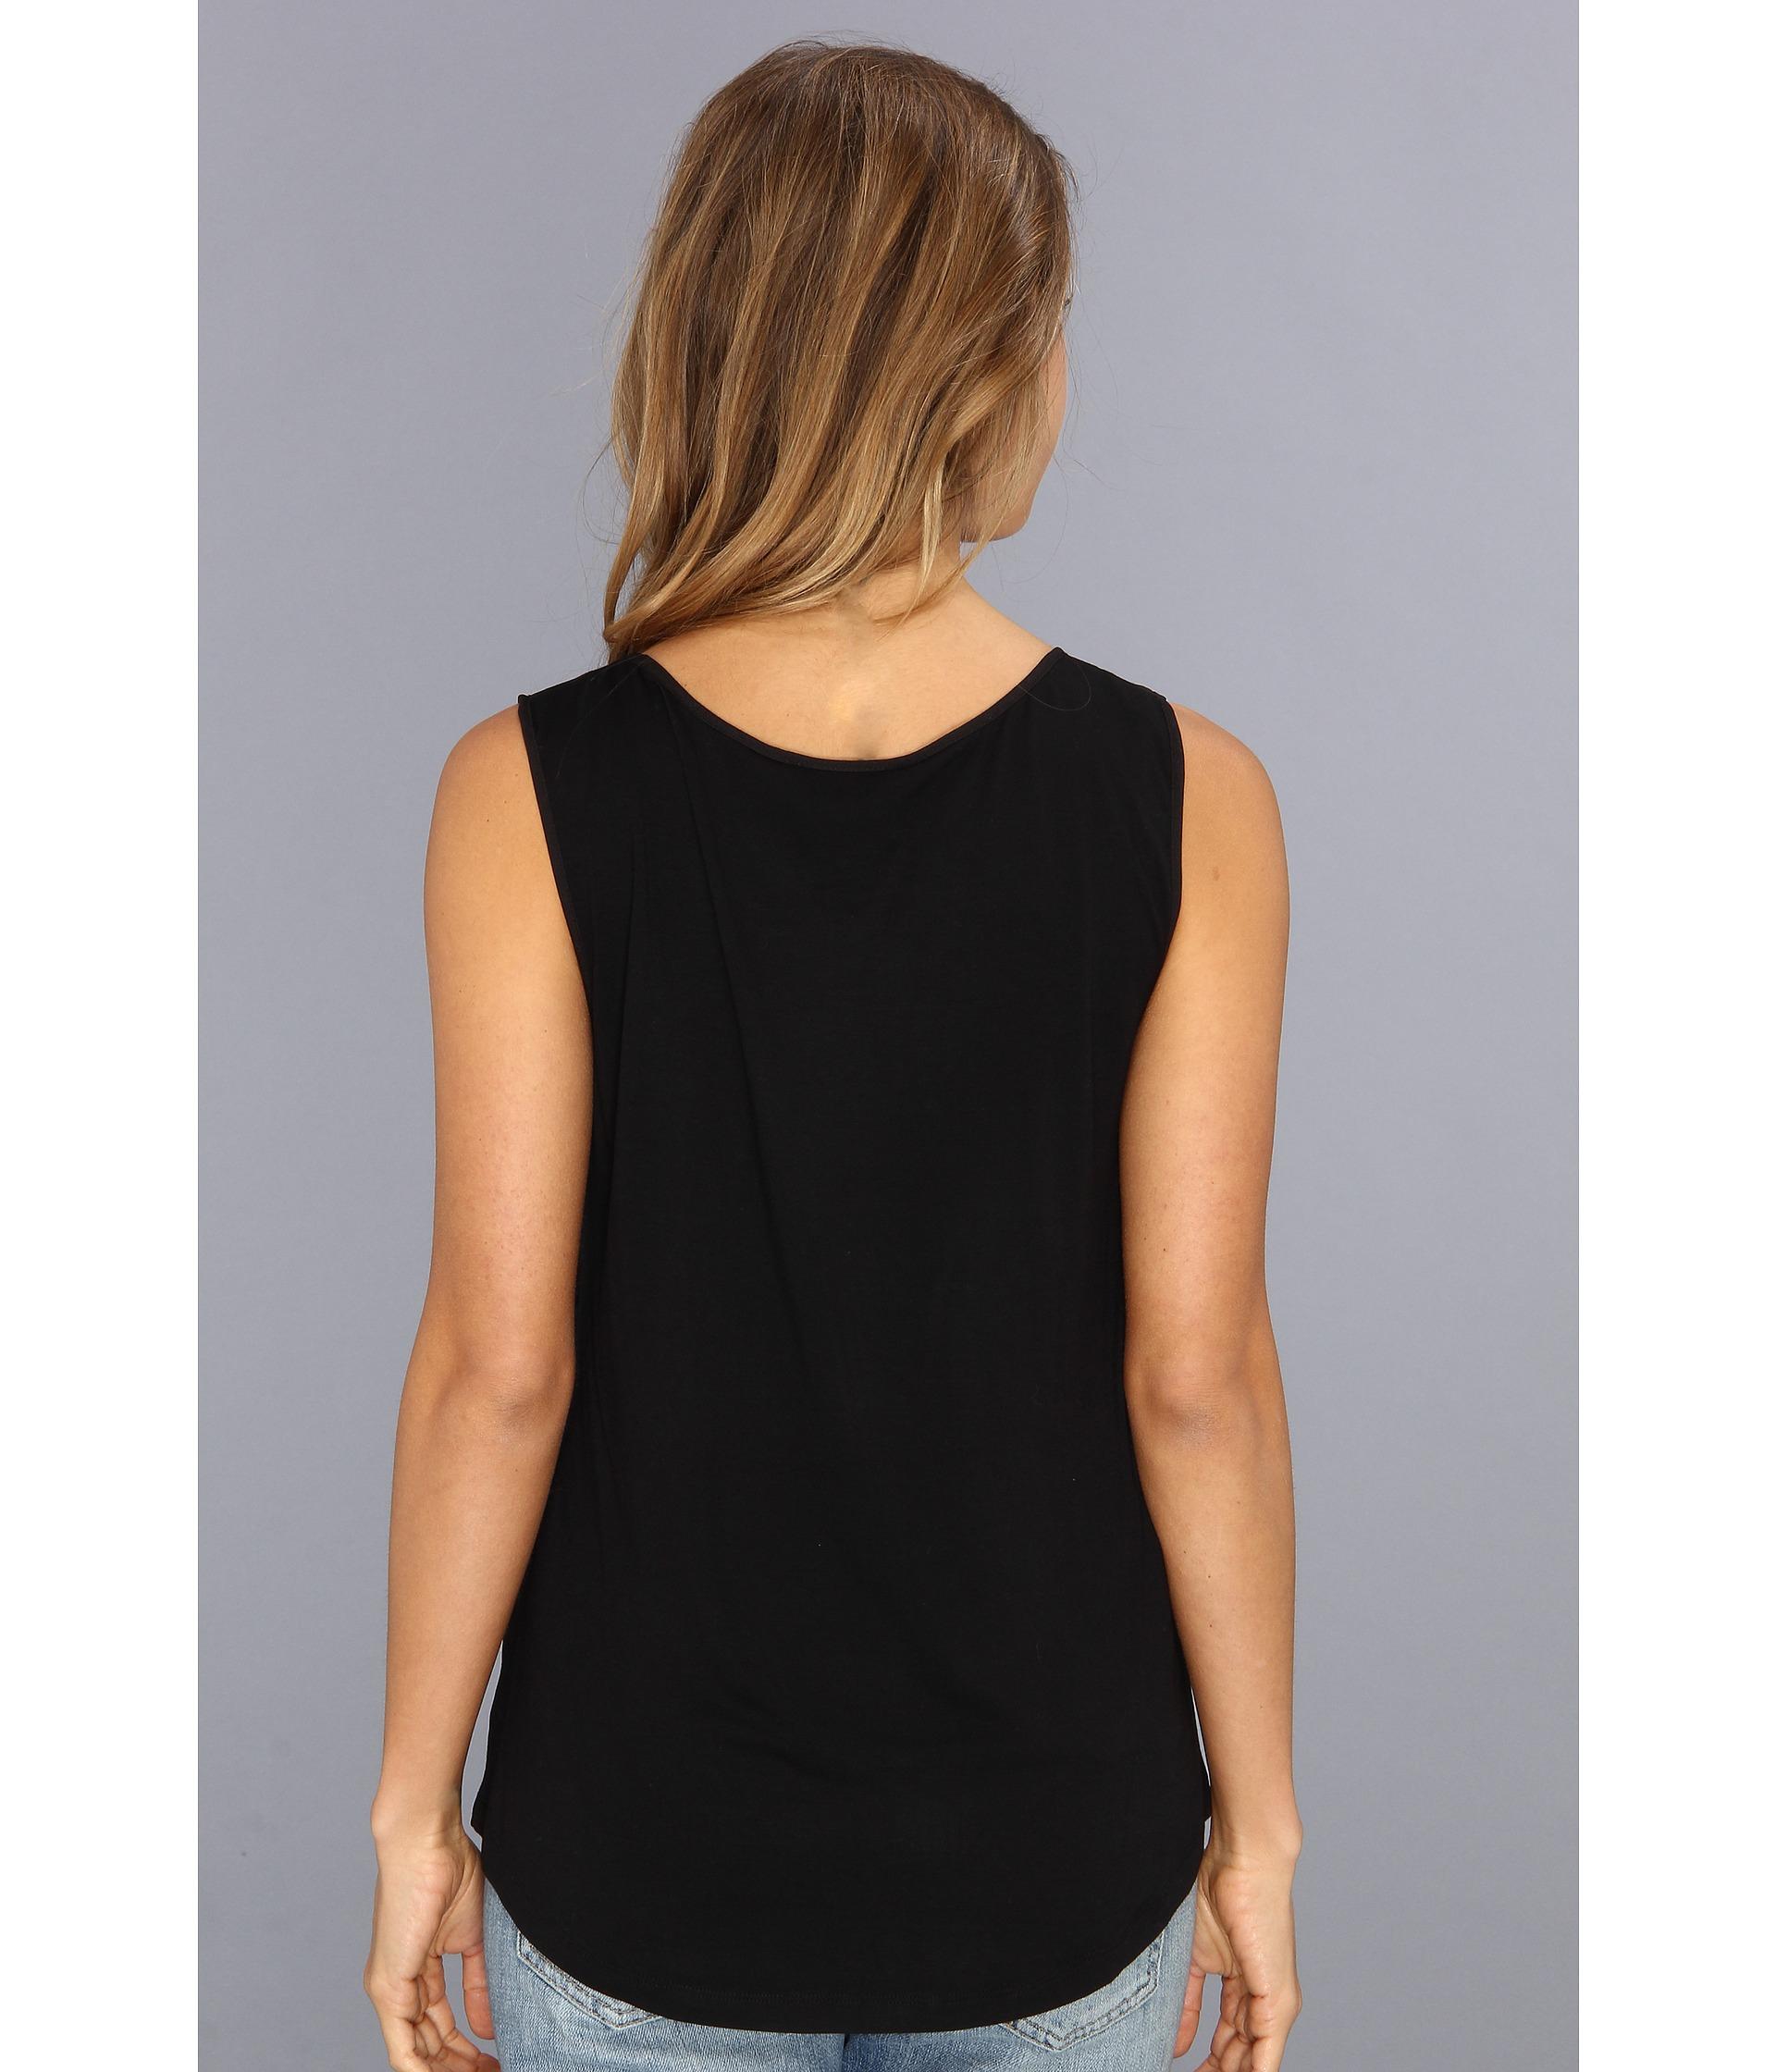 b100117dd589f1 Lyst - Calvin Klein One Pocket Sleeveless Tank Top in Black